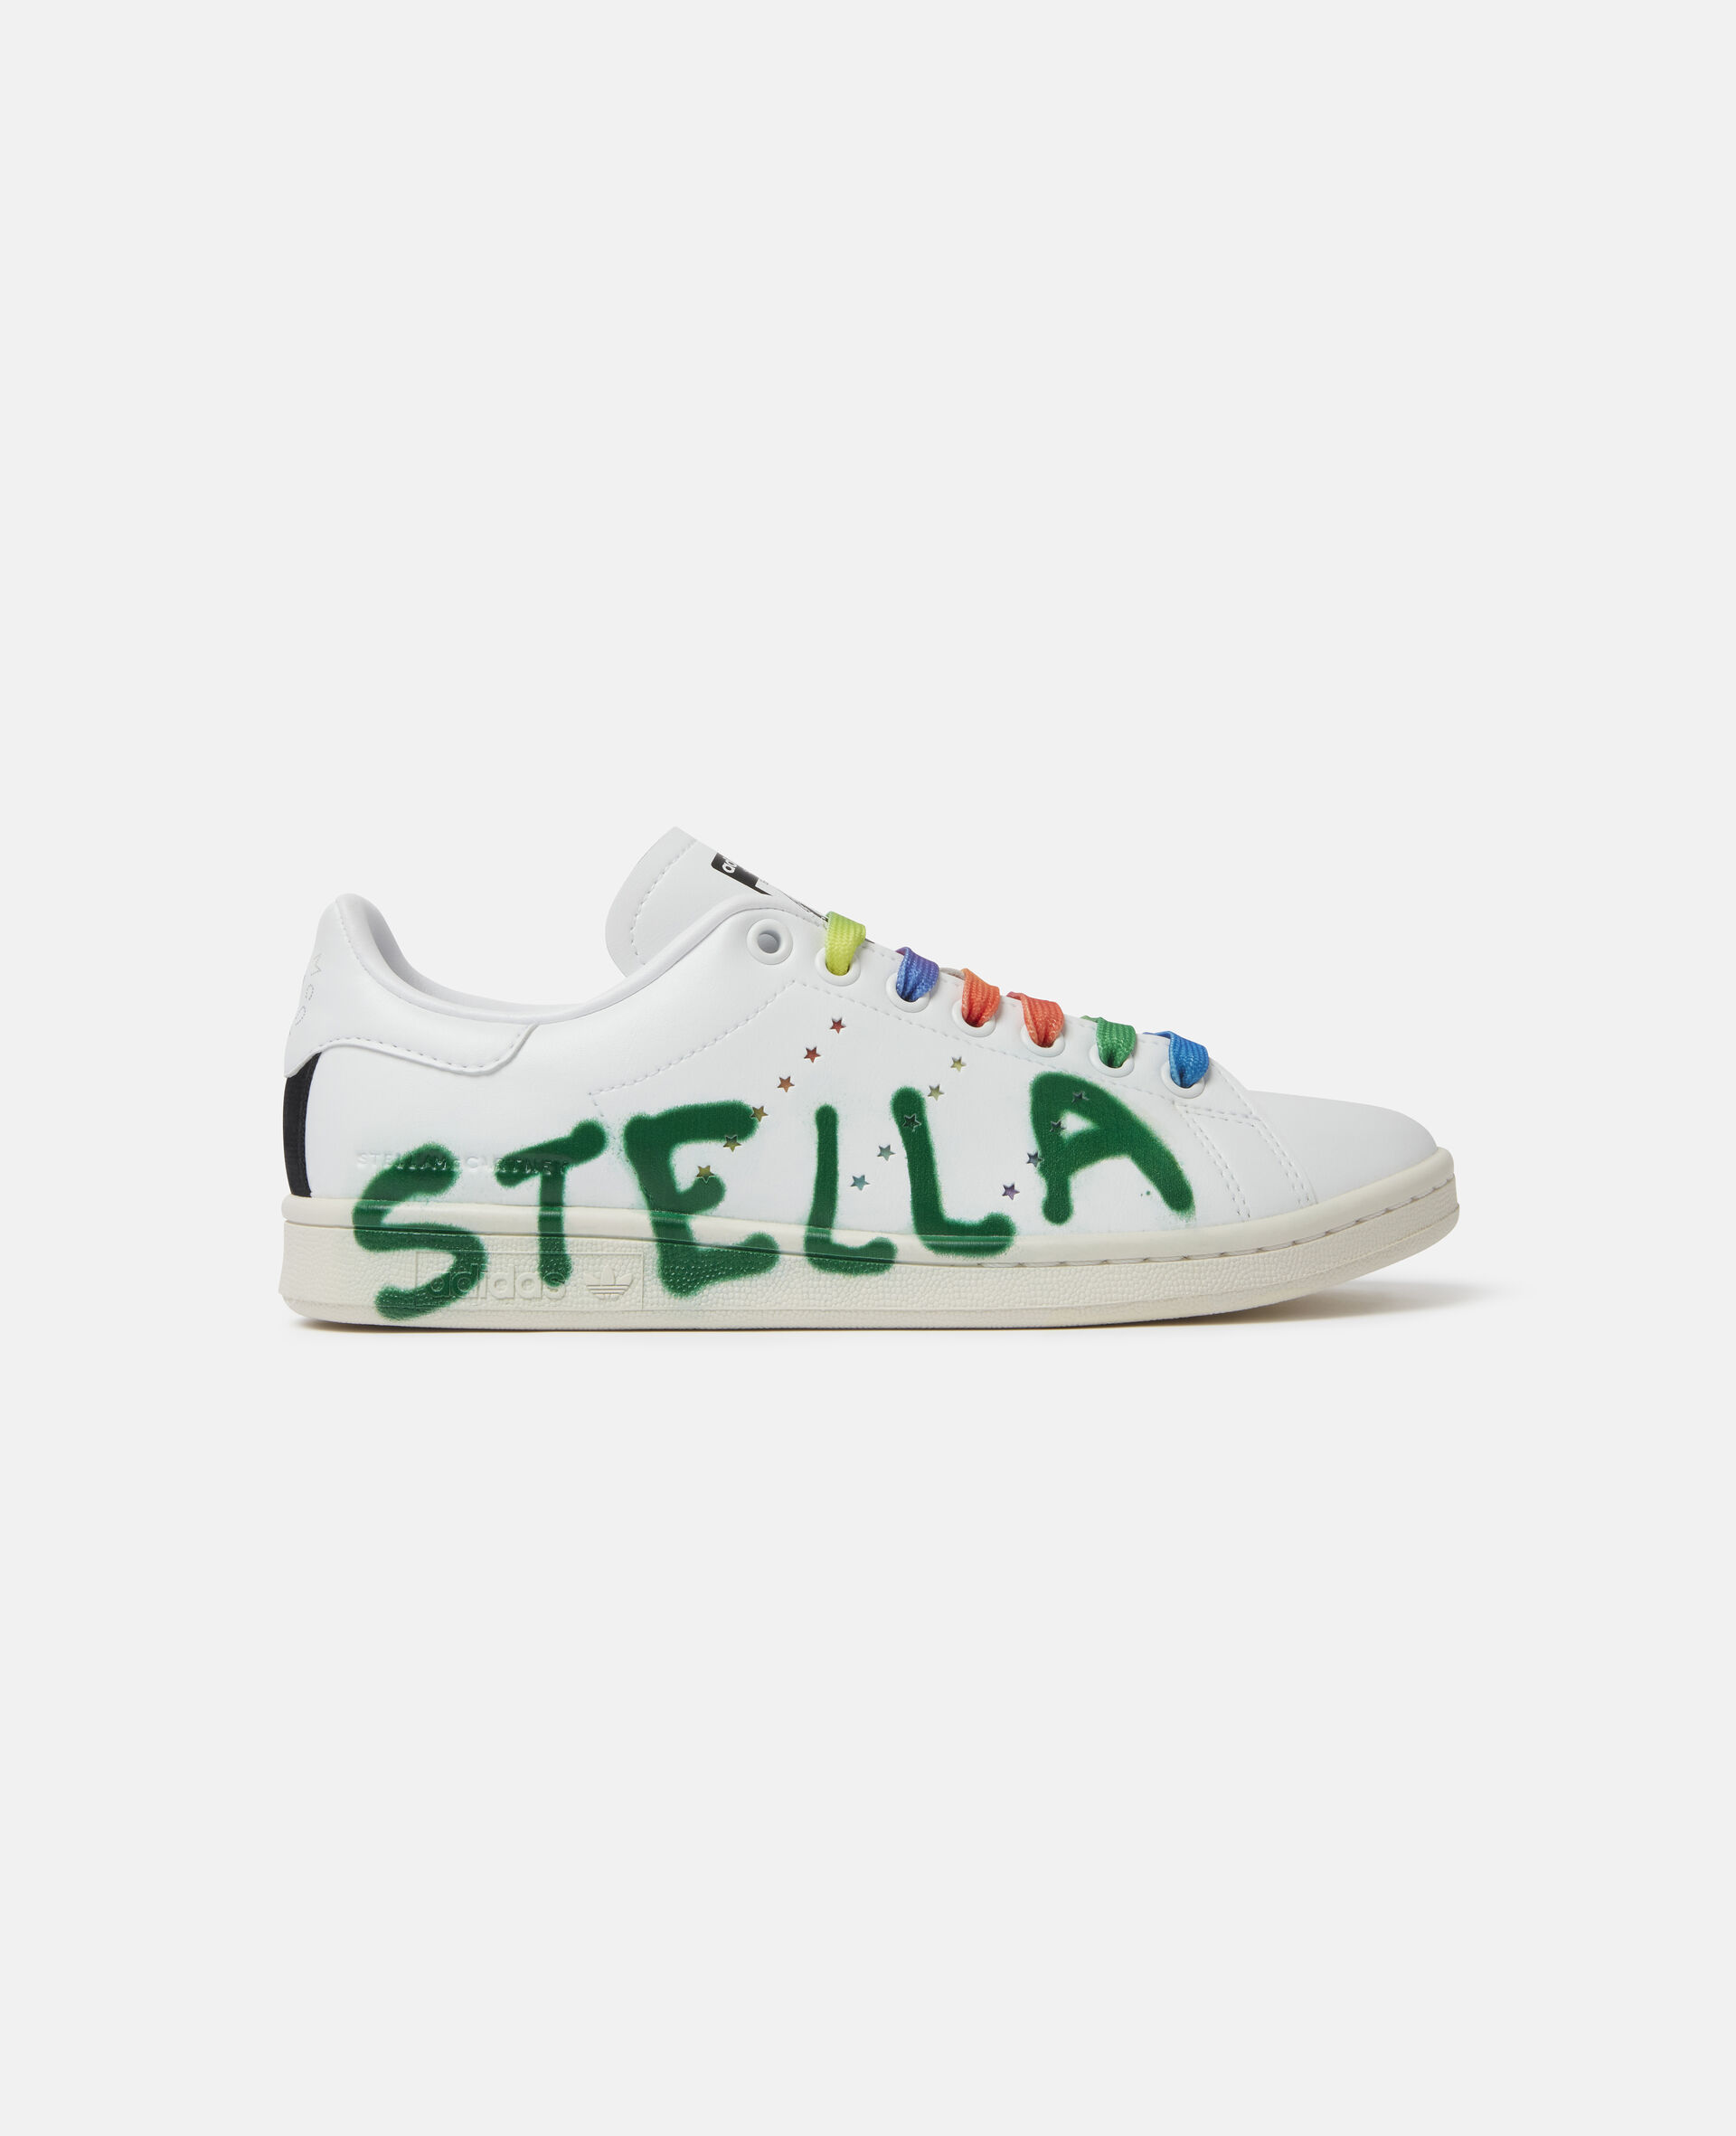 Ed Curtis Stella StanSmith adidas-Weiß-large image number 1